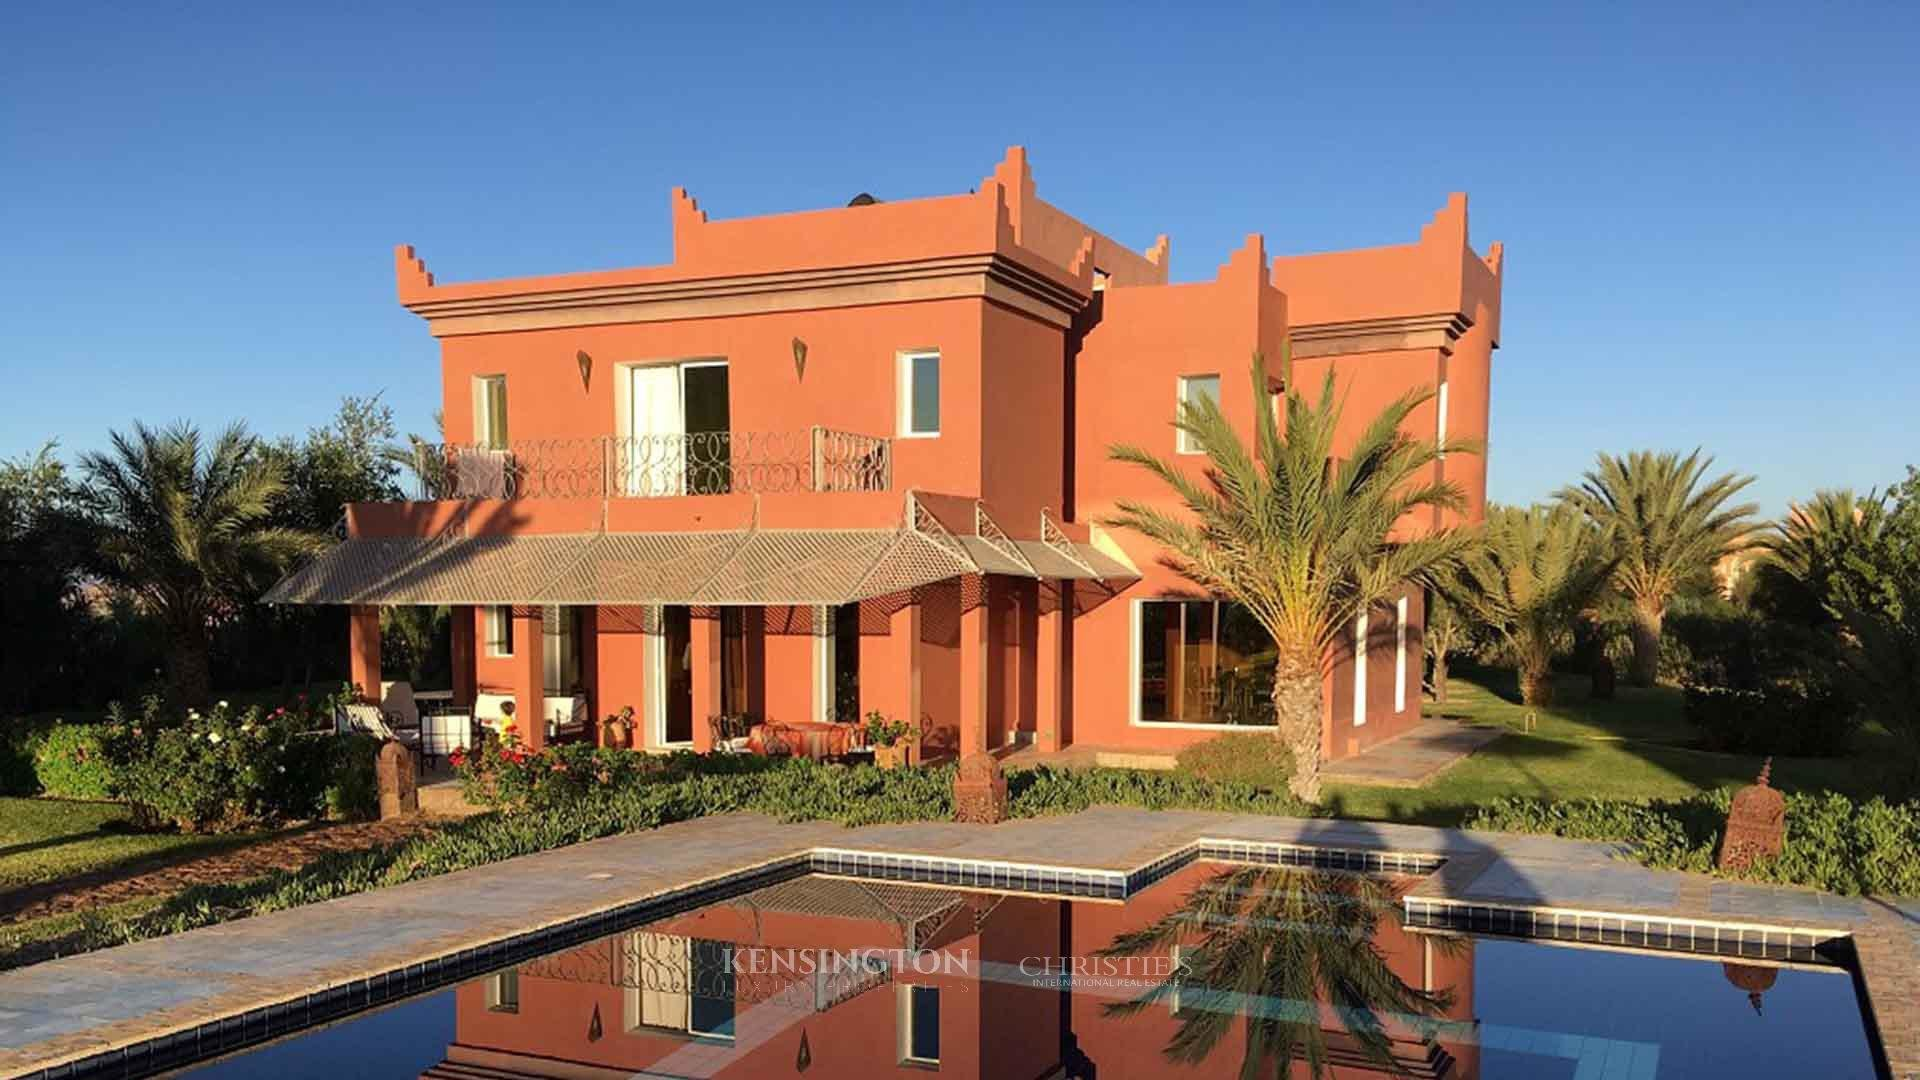 KPPM01013: Villa Malak Luxury Villa Ouarzazate Morocco